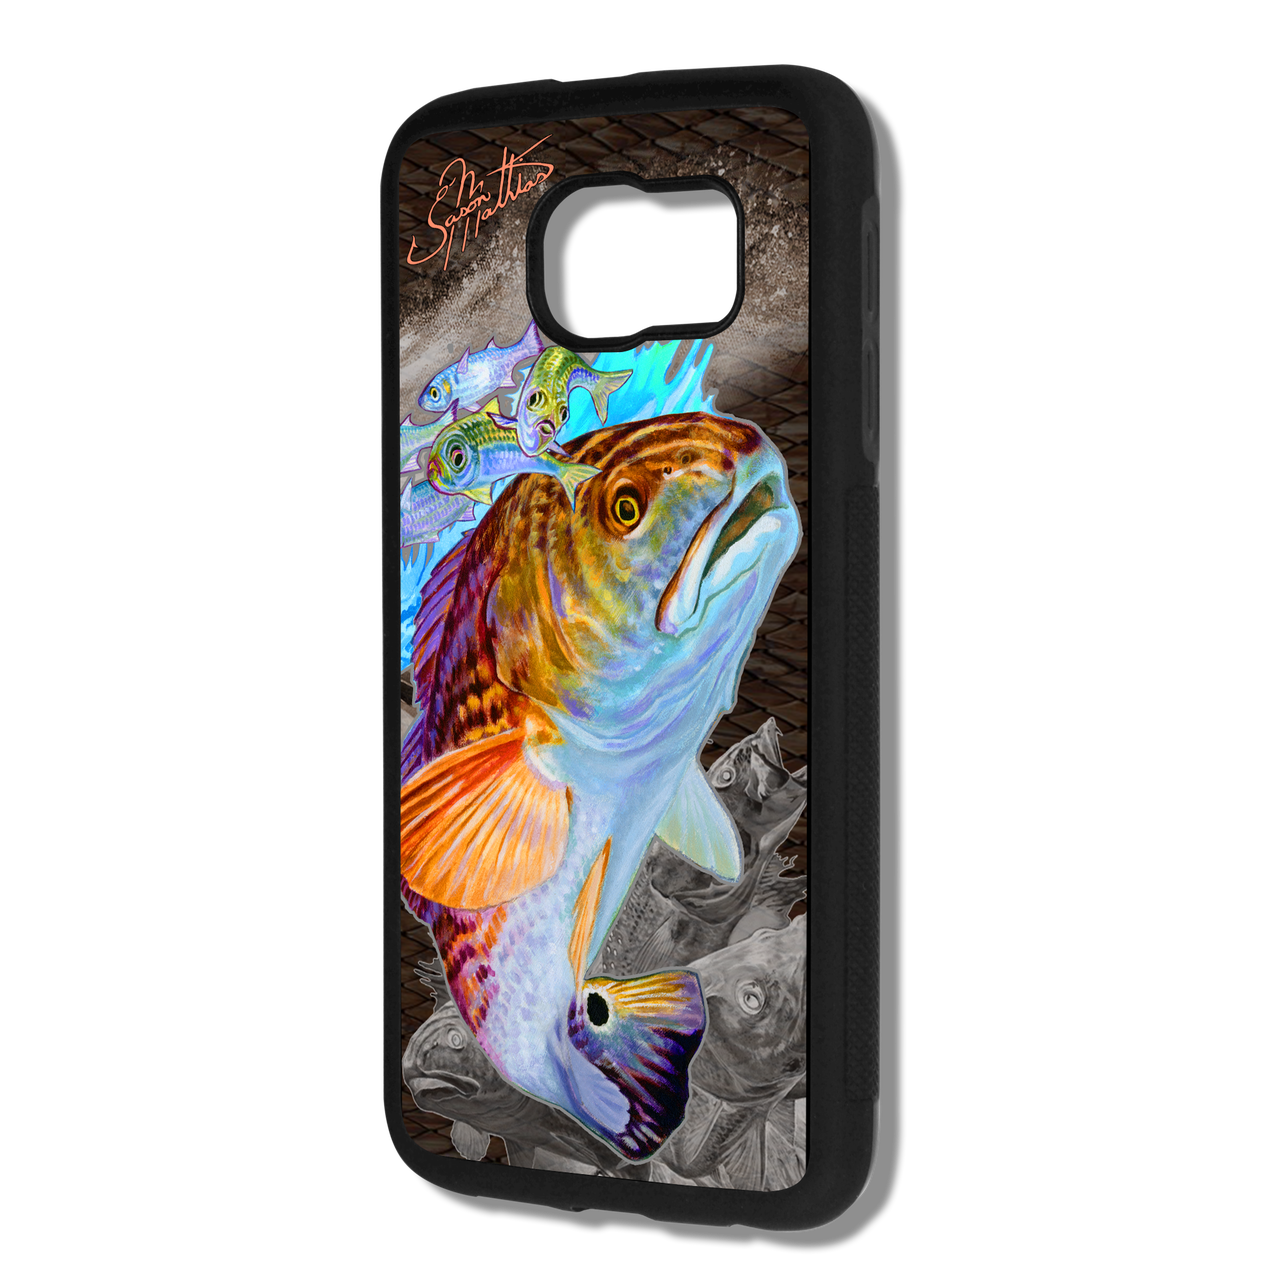 samsung-galaxy-case-cover-redfish-jason-mathias-art.png